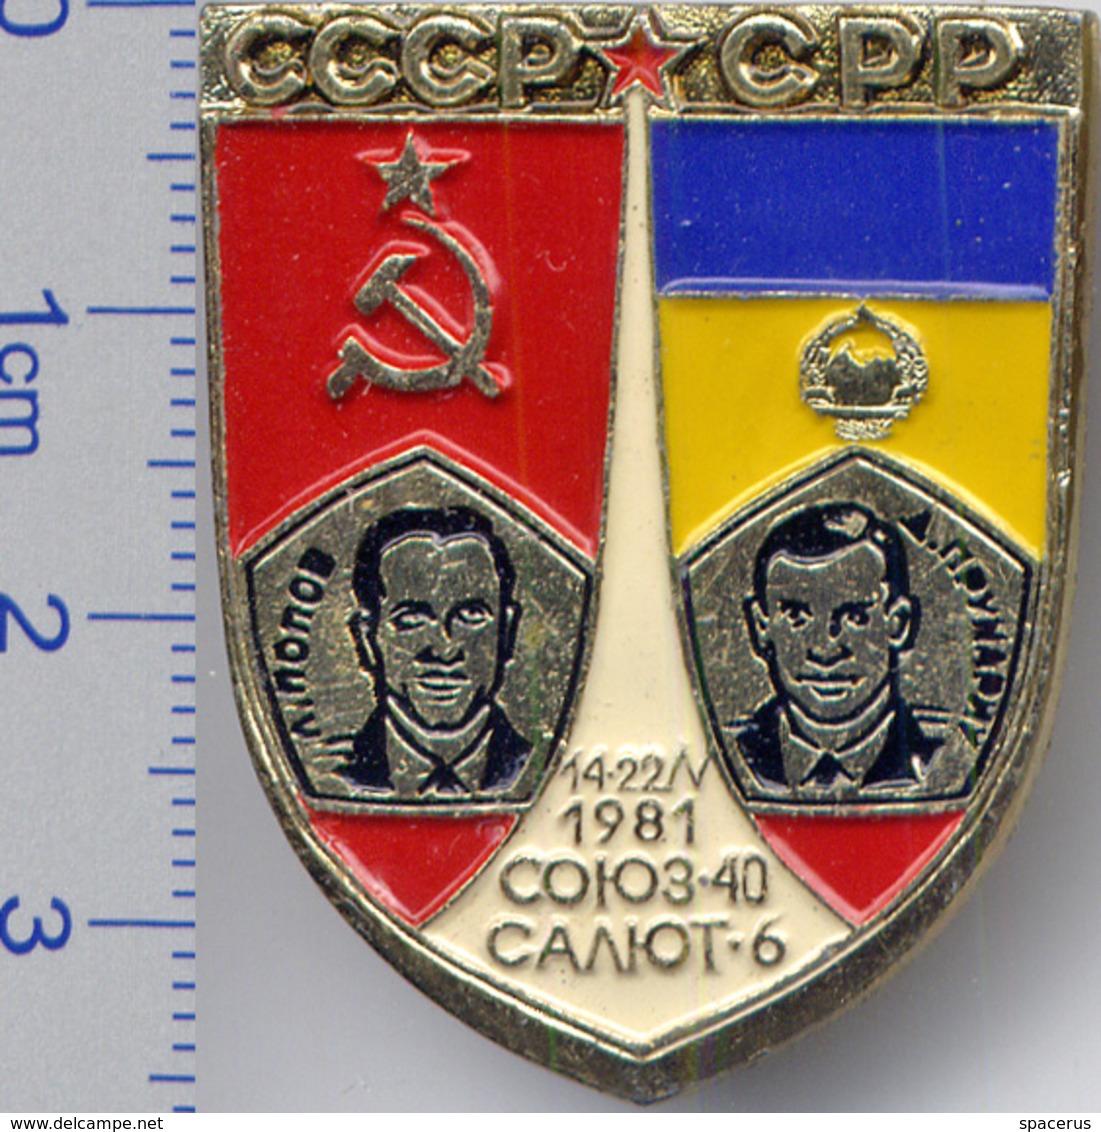 108 Space Soviet Russia Pin. INTERKOSMOS USSR-SRR (Romania) 1981 Soyuz-40 Salut-6 - Space